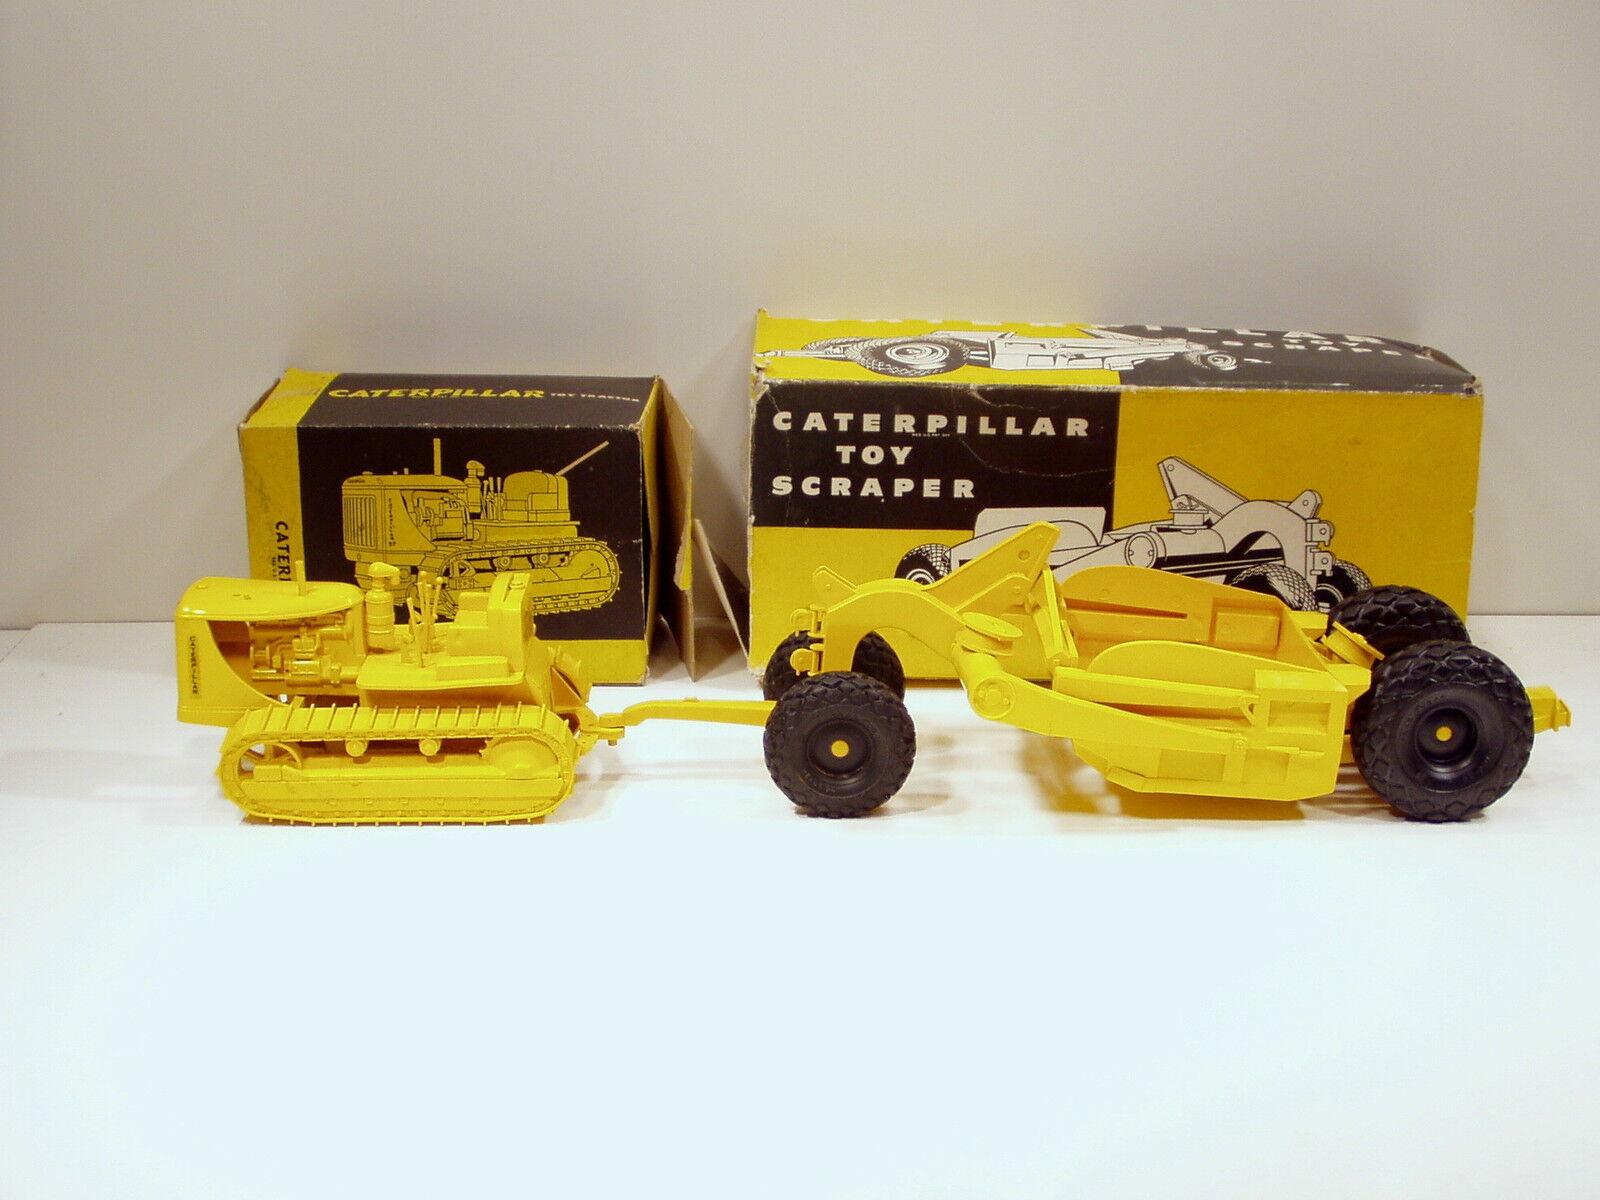 Caterpillar D7 Crawler & 70 Pull Raspador - -Plástico-Cruver-C  Cajas